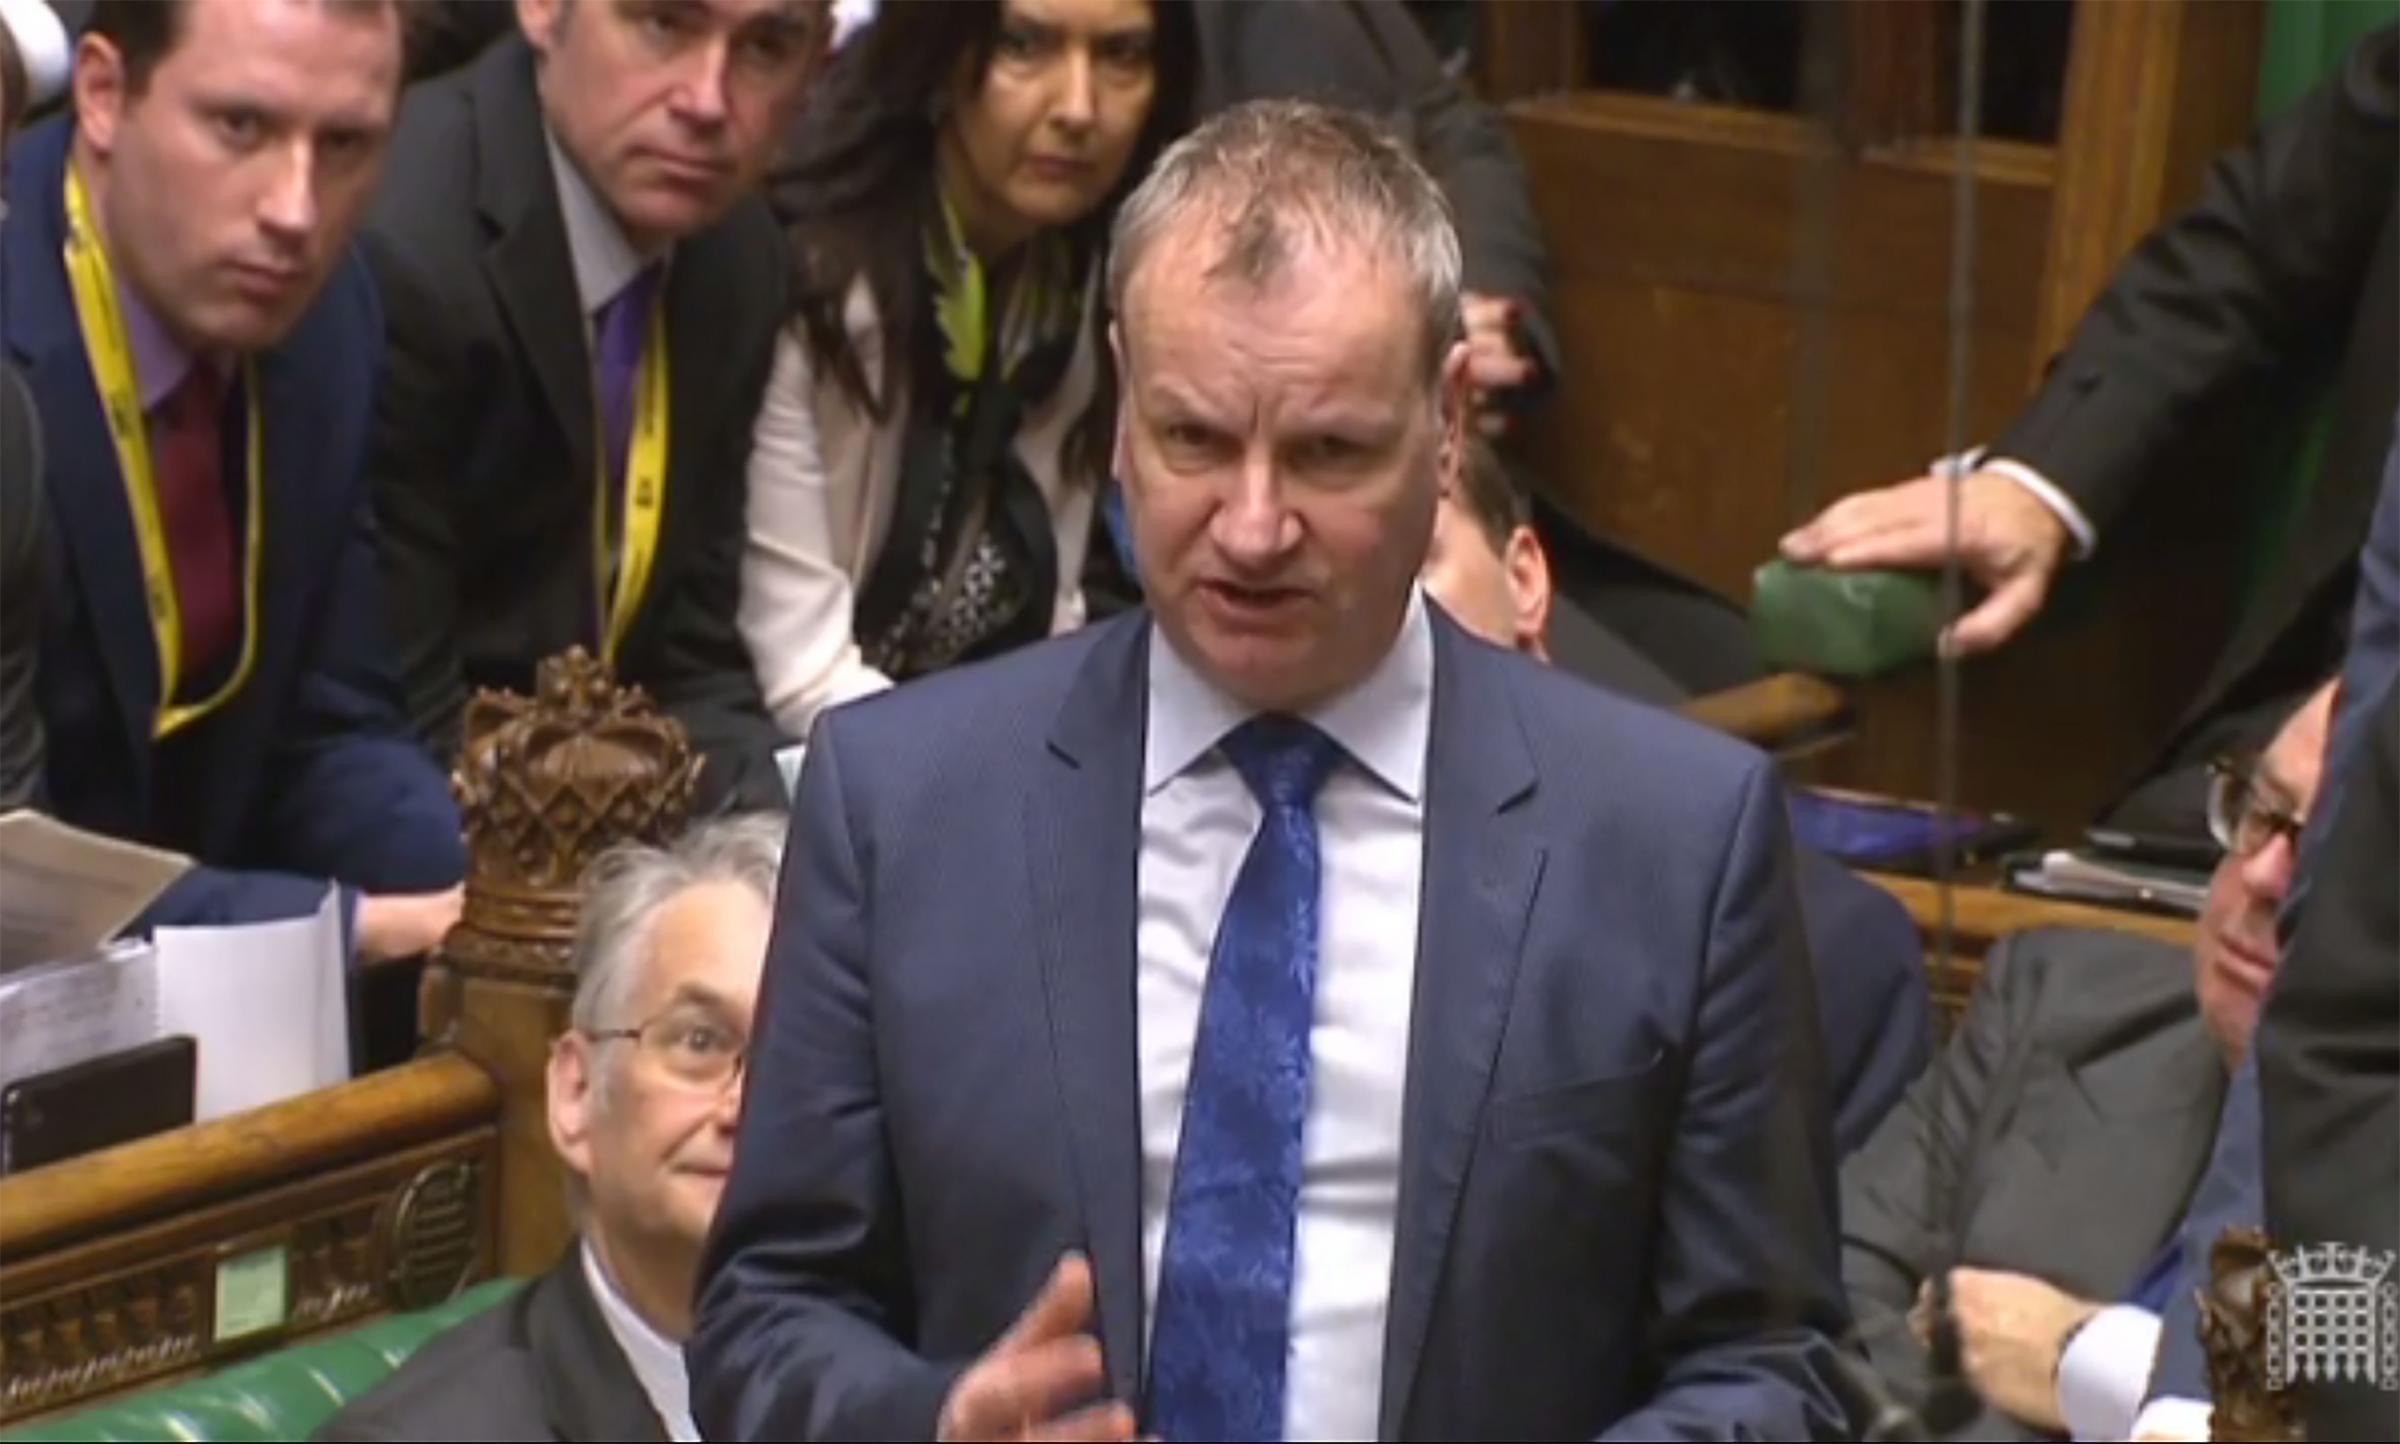 Veteran SNP MP slams calls for 'advisory' independence referendum